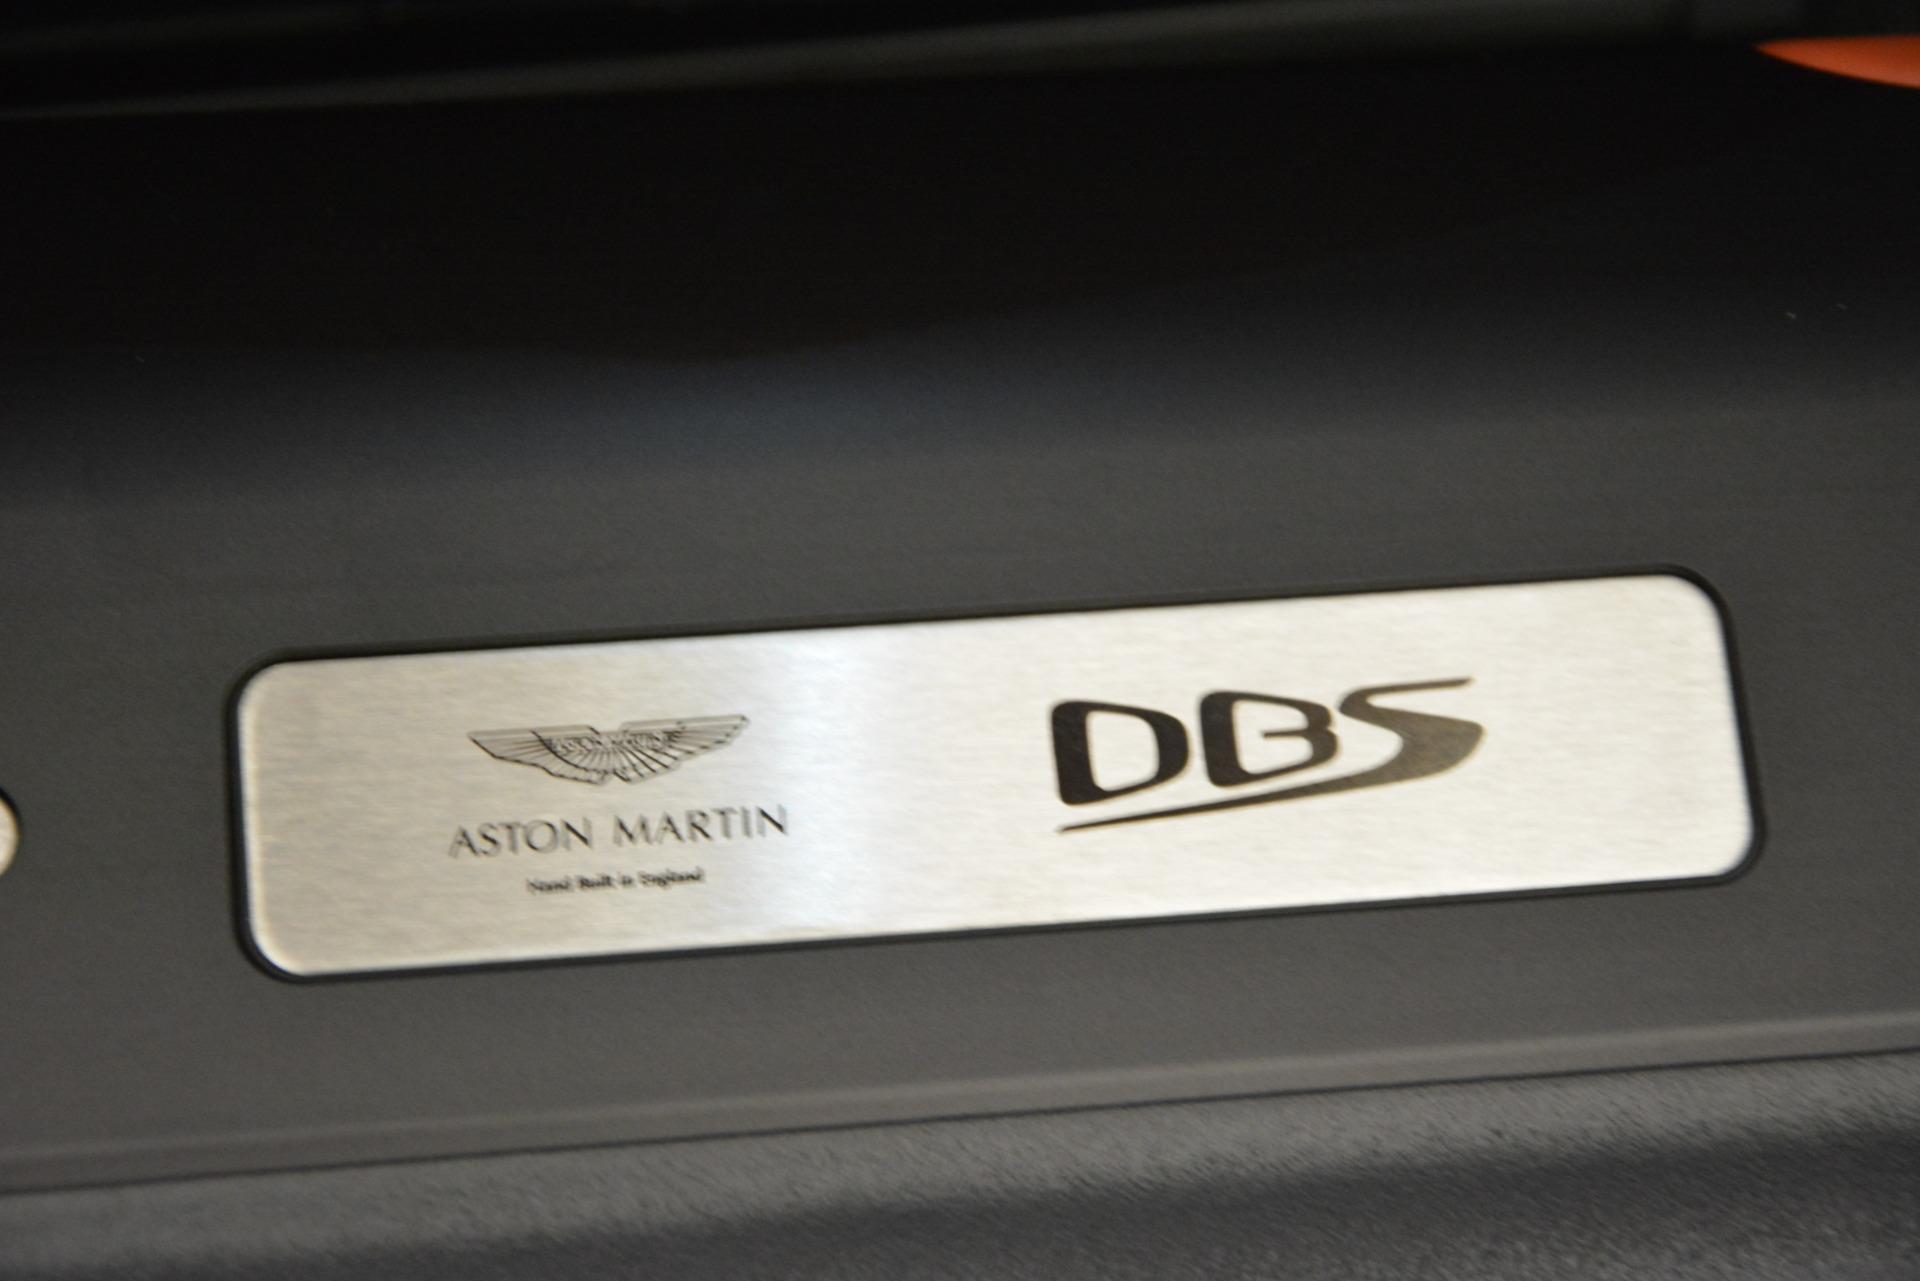 New 2019 Aston Martin DBS Superleggera For Sale In Greenwich, CT 2827_p27